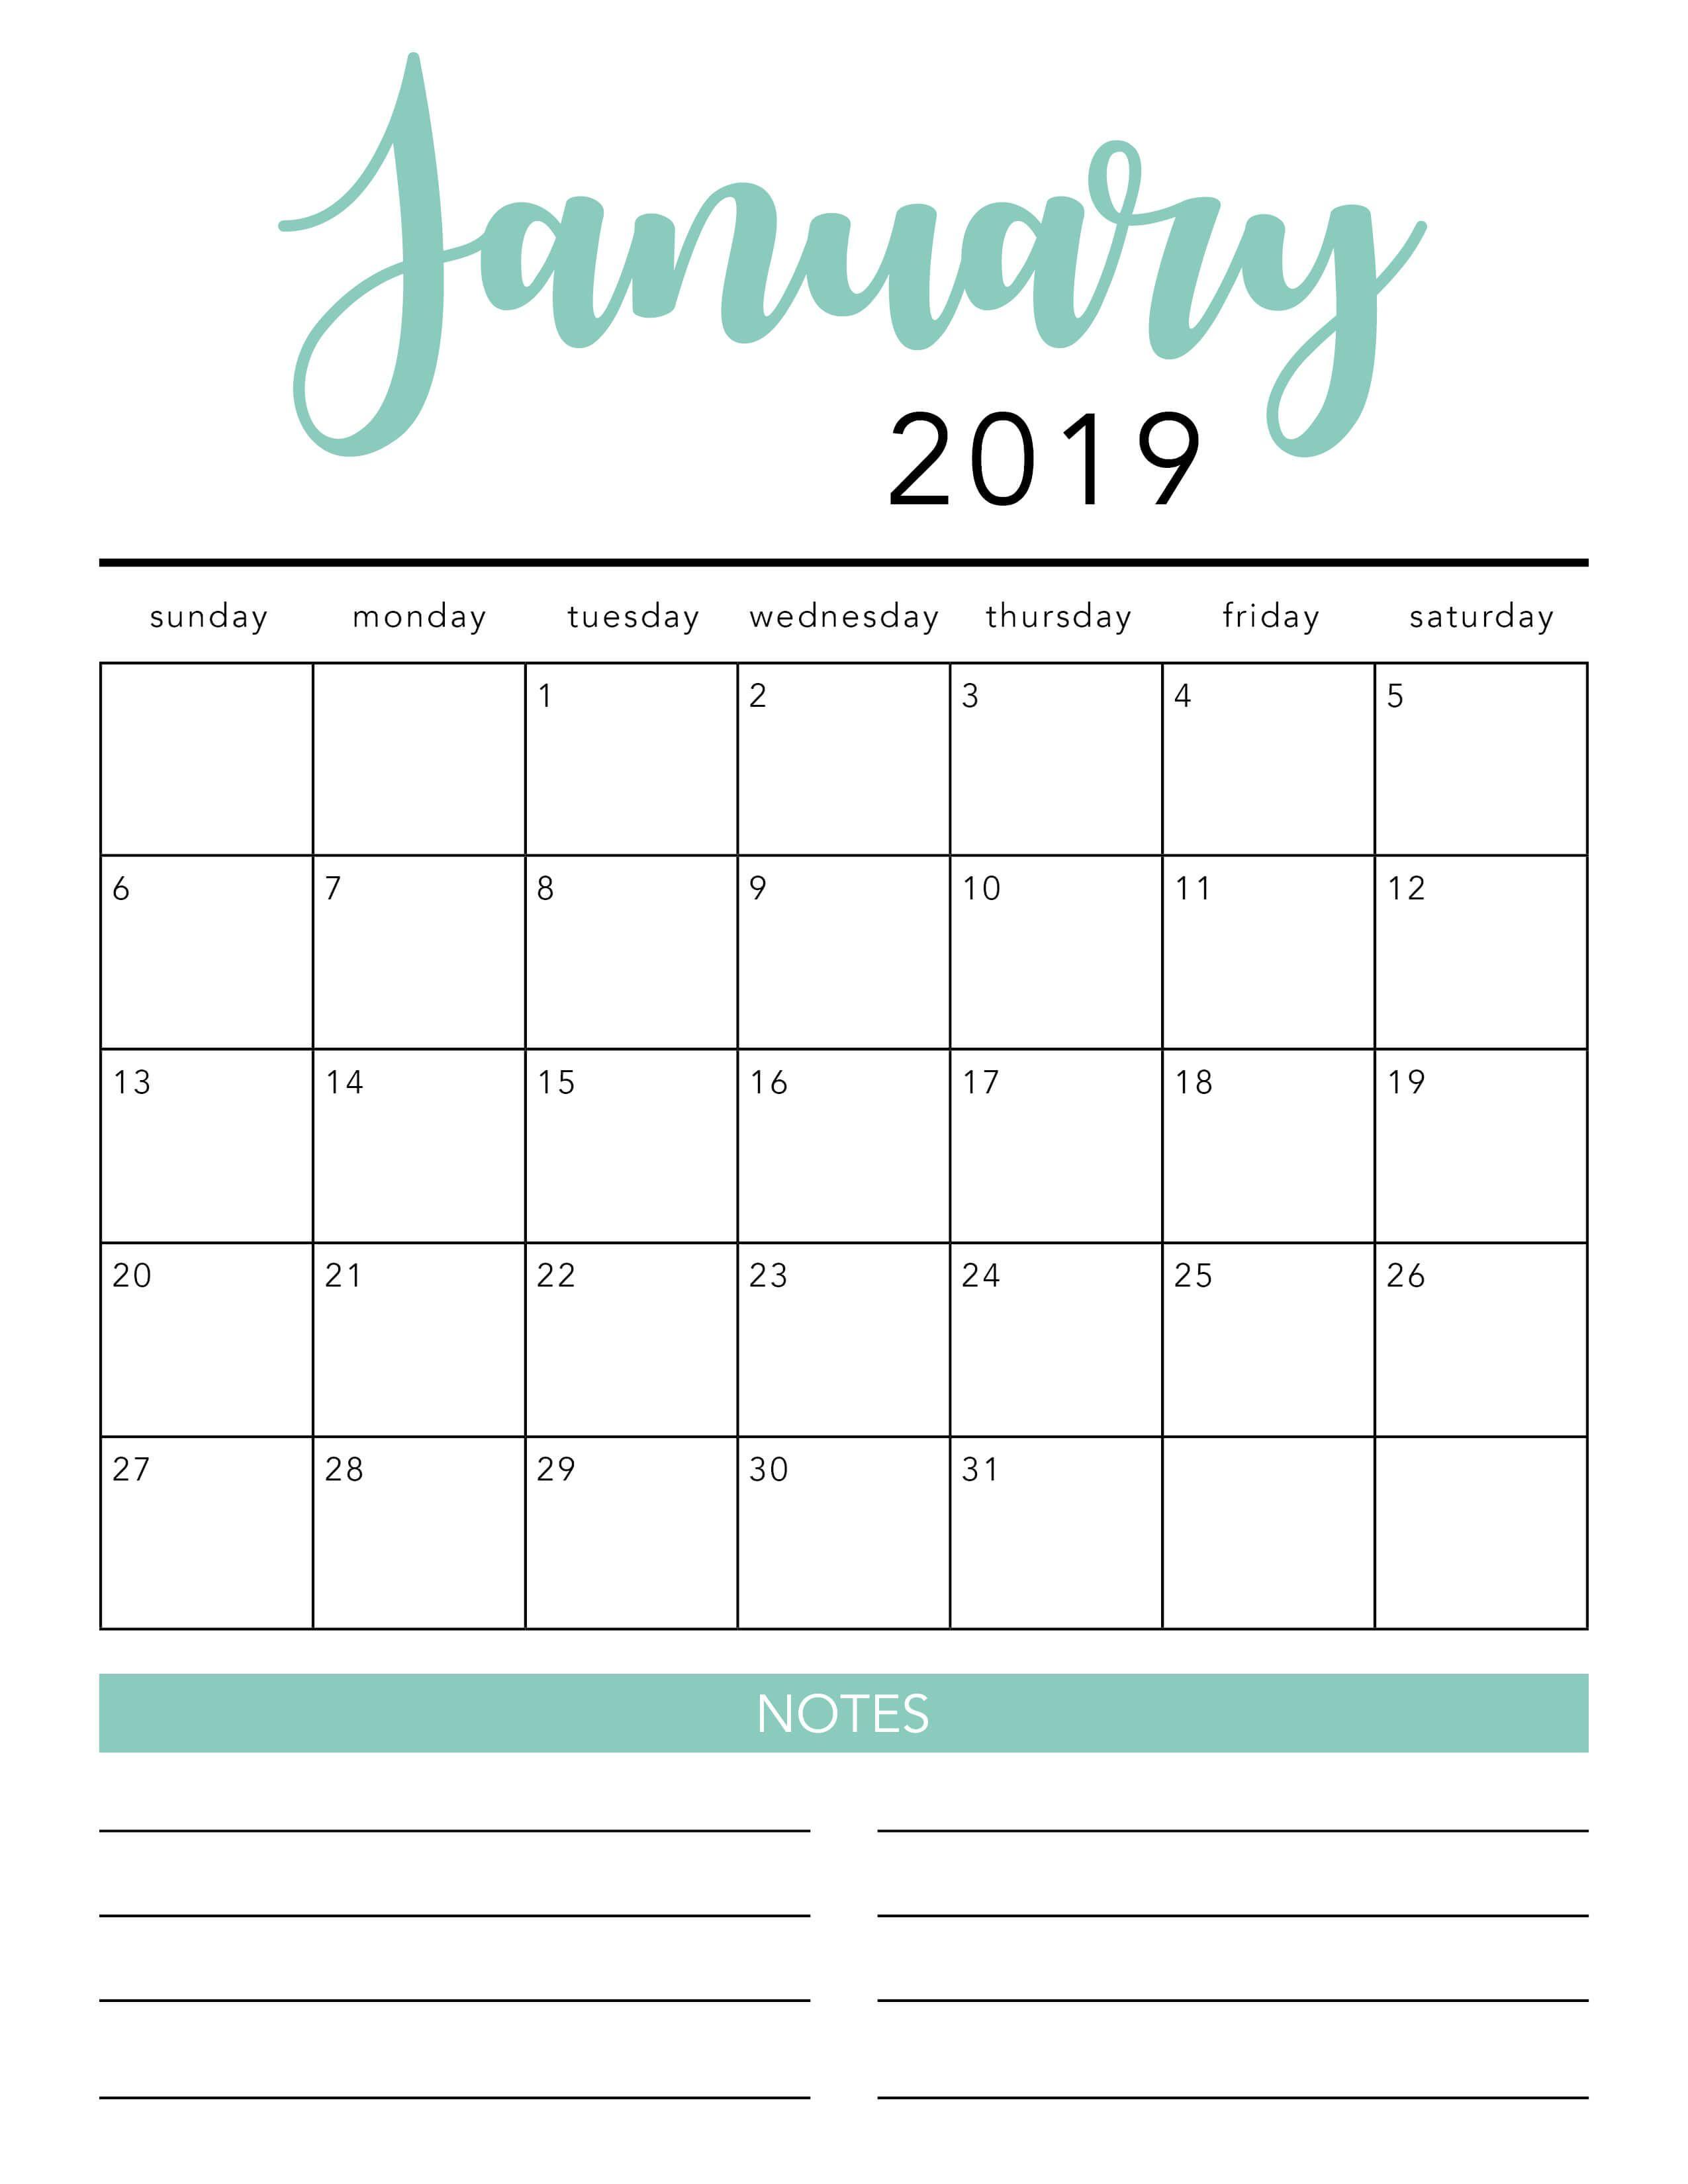 Free 2019 Printable Calendar Template (2 Colors!) - I Heart Naptime for Free Printable Preschool Handprint Calendar Templates